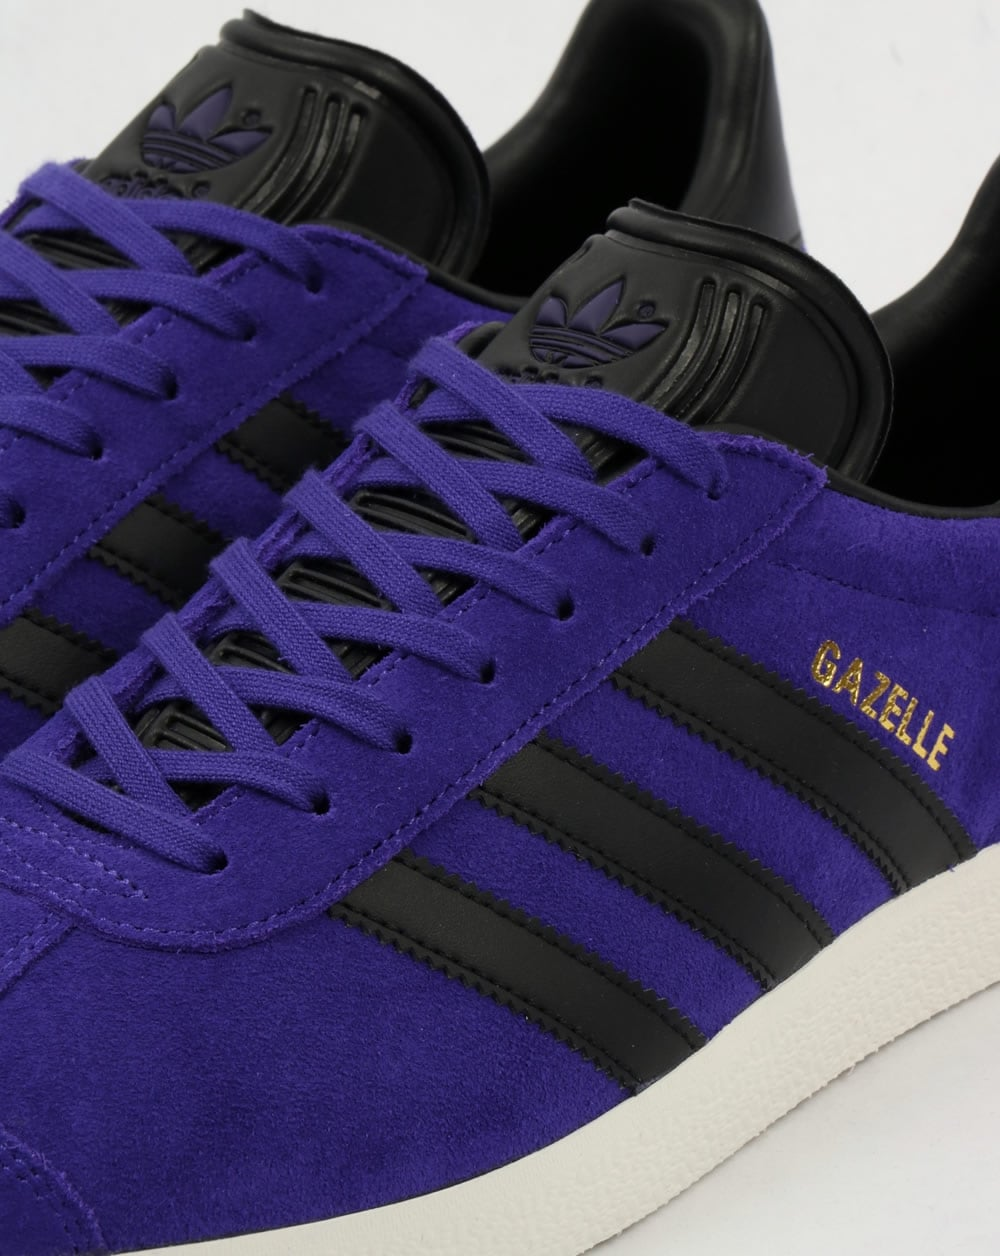 Adidas Gazelle Trainers Purple/Black